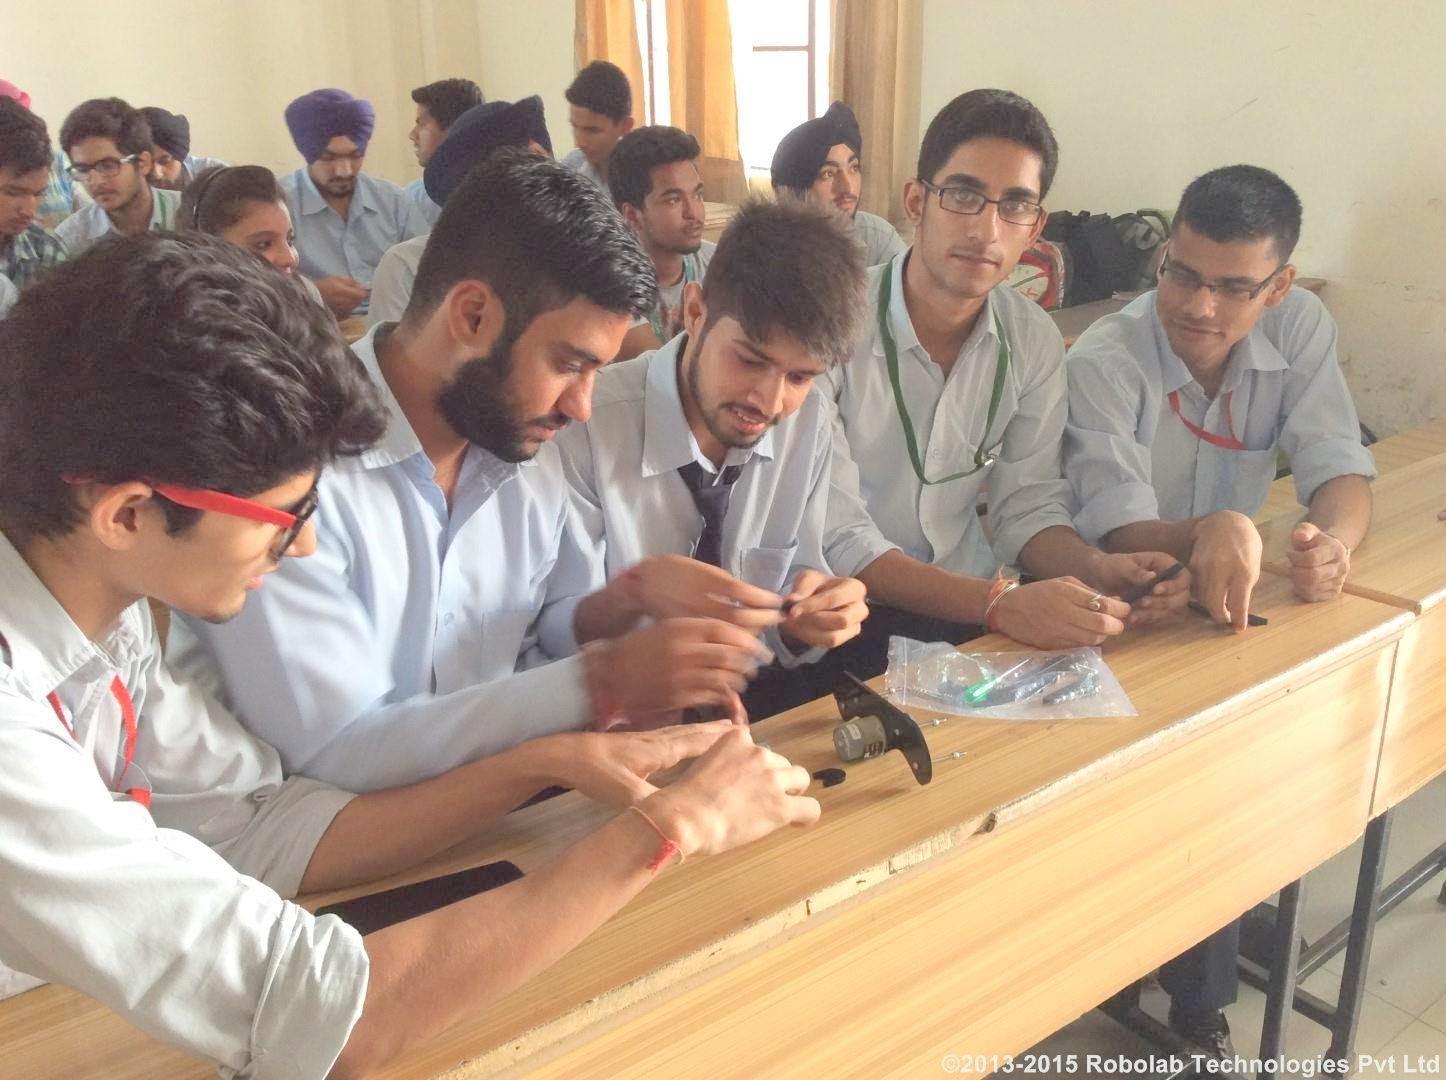 Amritsar College Of Engineering and Technology, Amritsar Robolab 15 (31).jpg